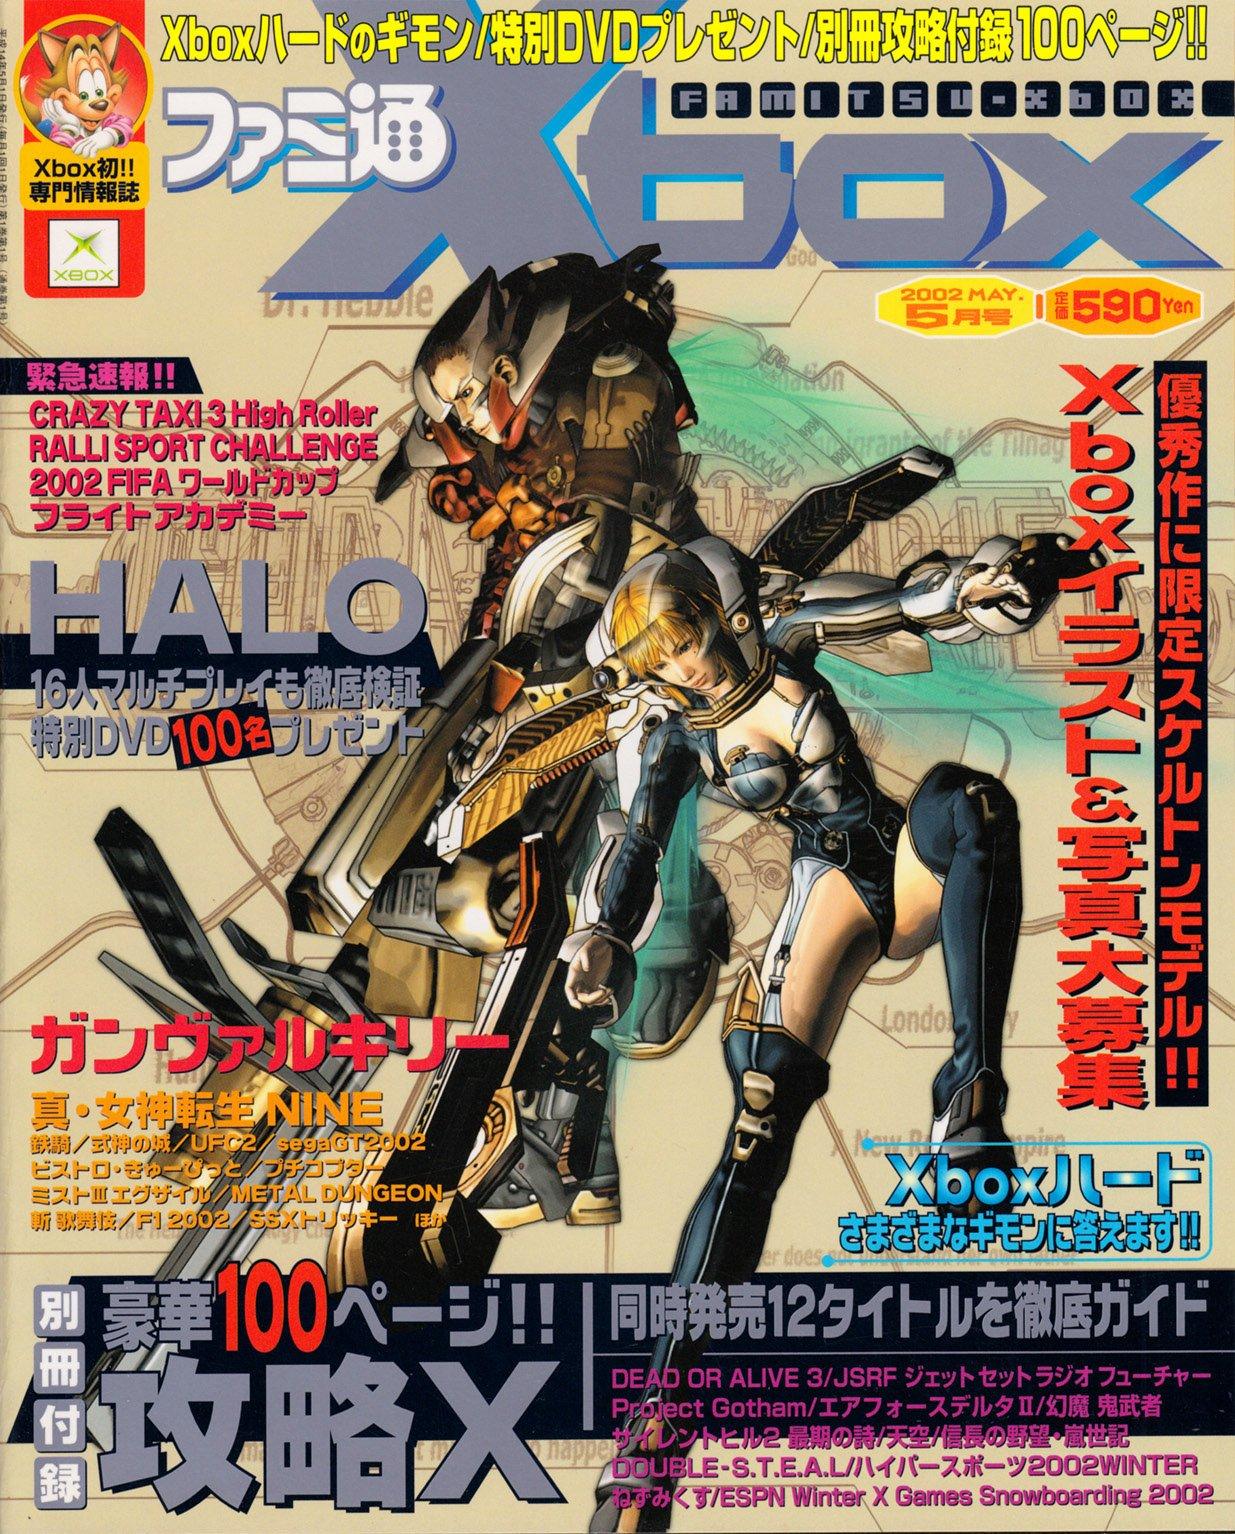 Famitsu Xbox Issue 003 (May 2002)